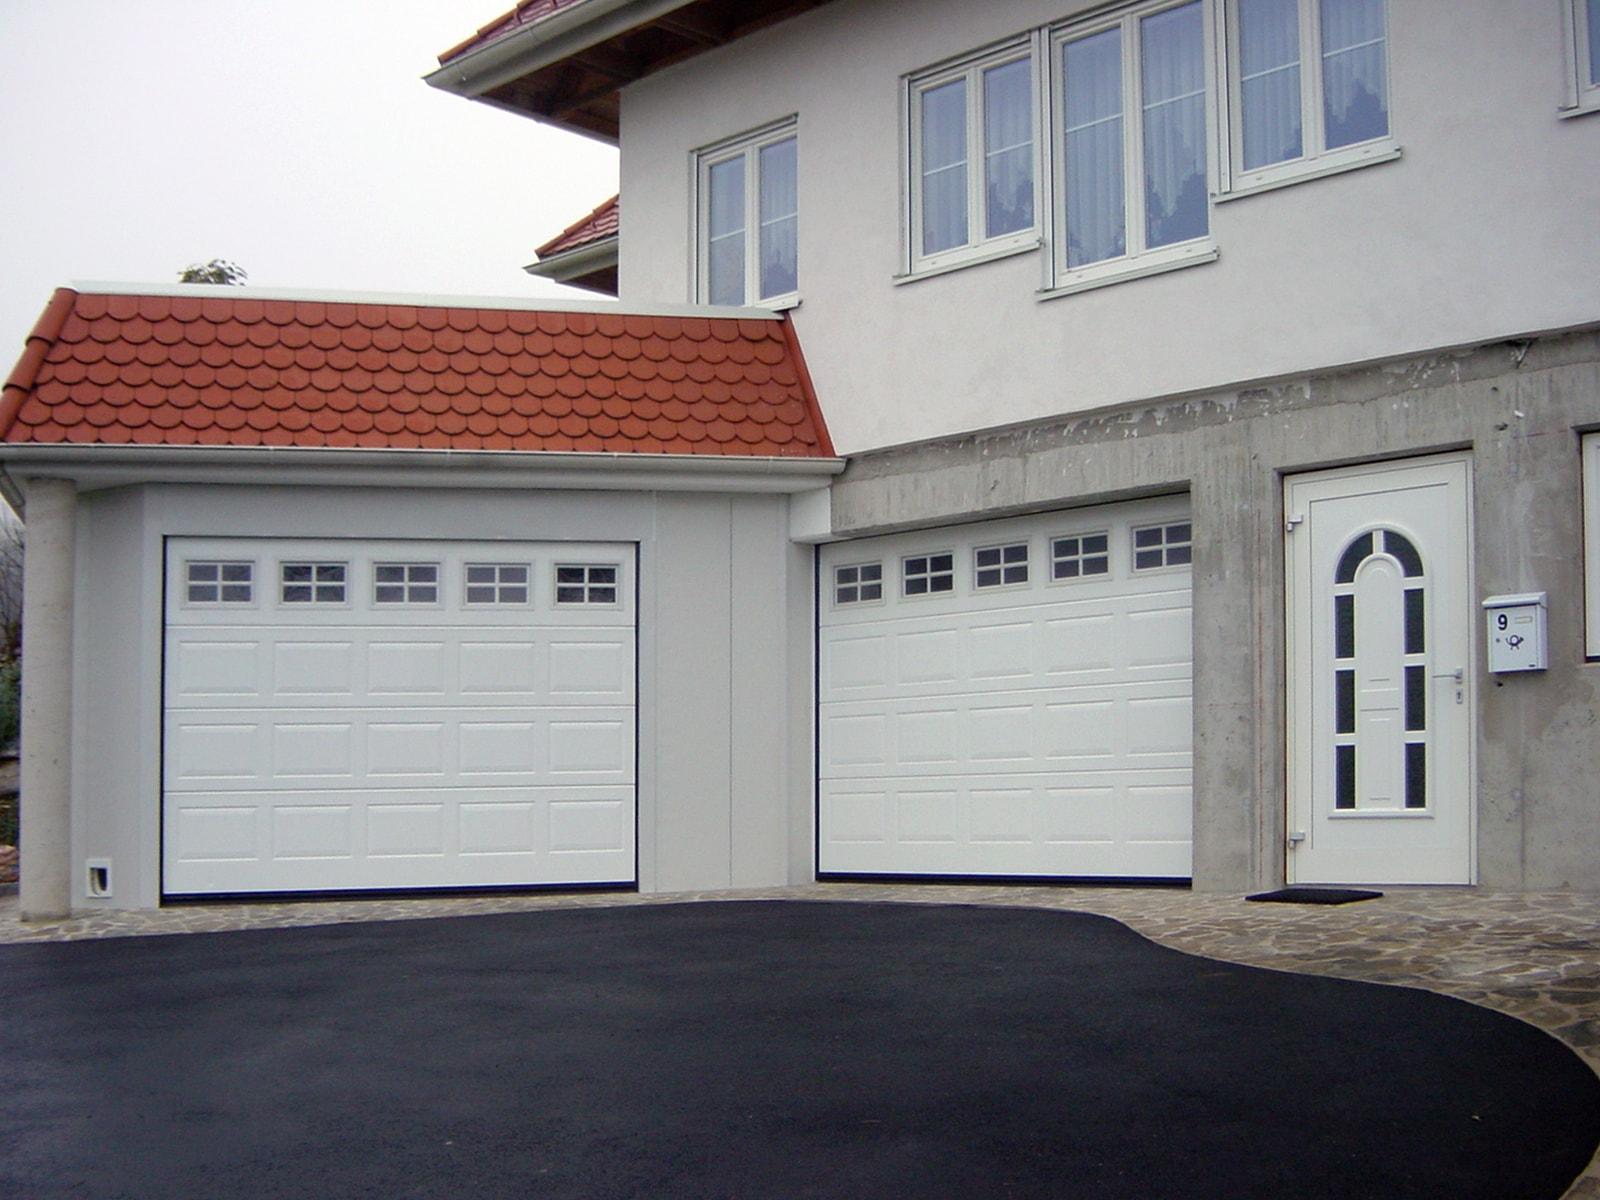 Portone sezionale da garage IRIS - Stucco bianco C81